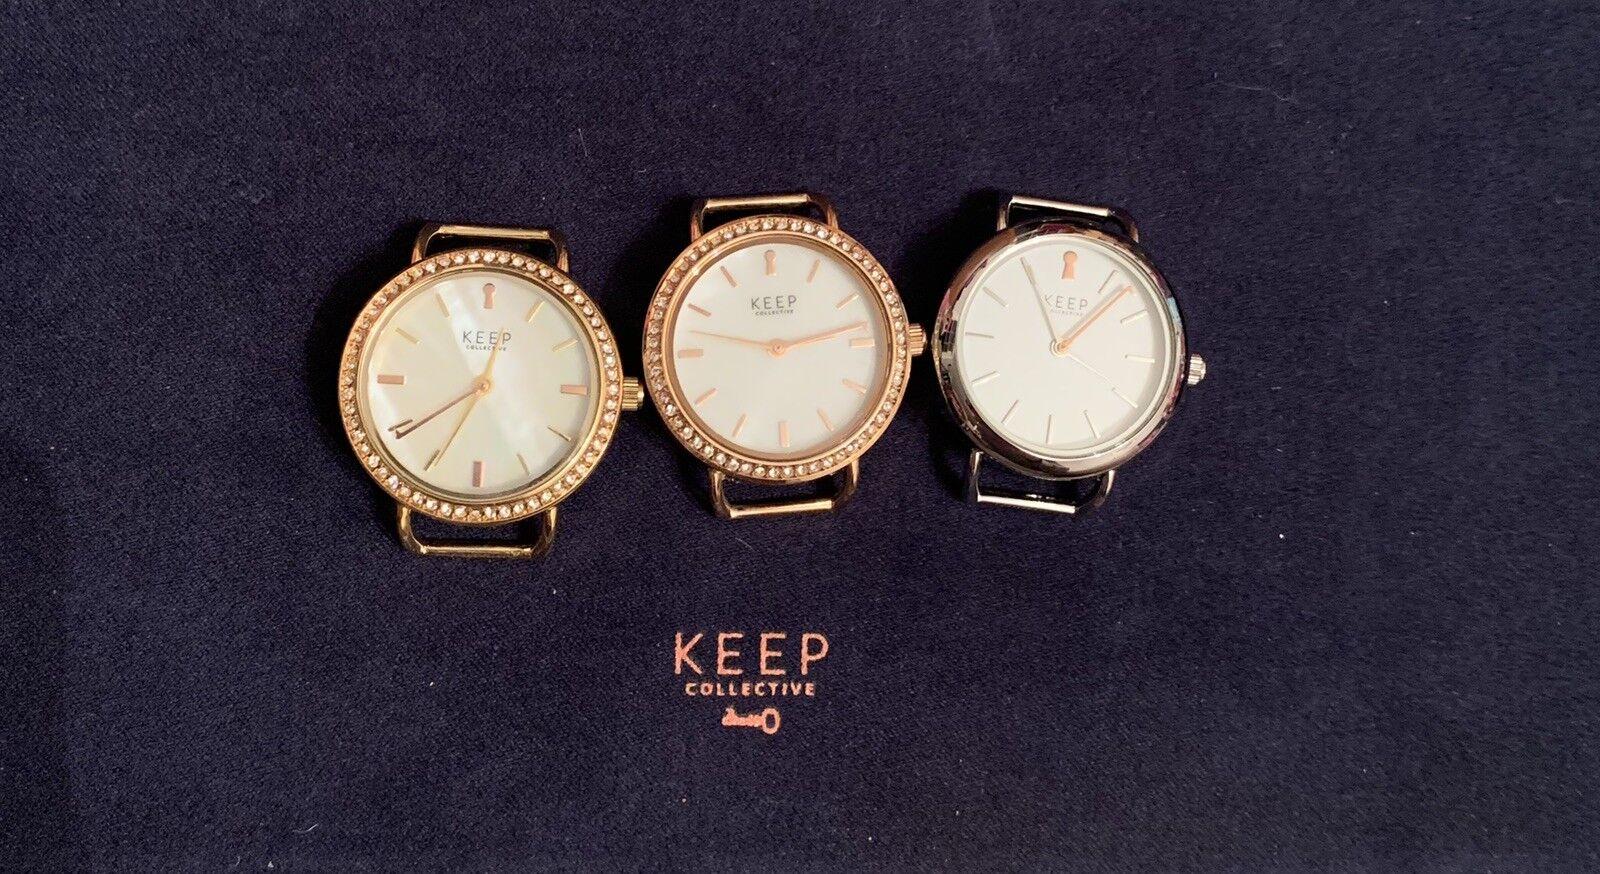 6b761e1b71c7 Keep 3 Timekey Lot Collective nnebra25-Jewelry - www ...